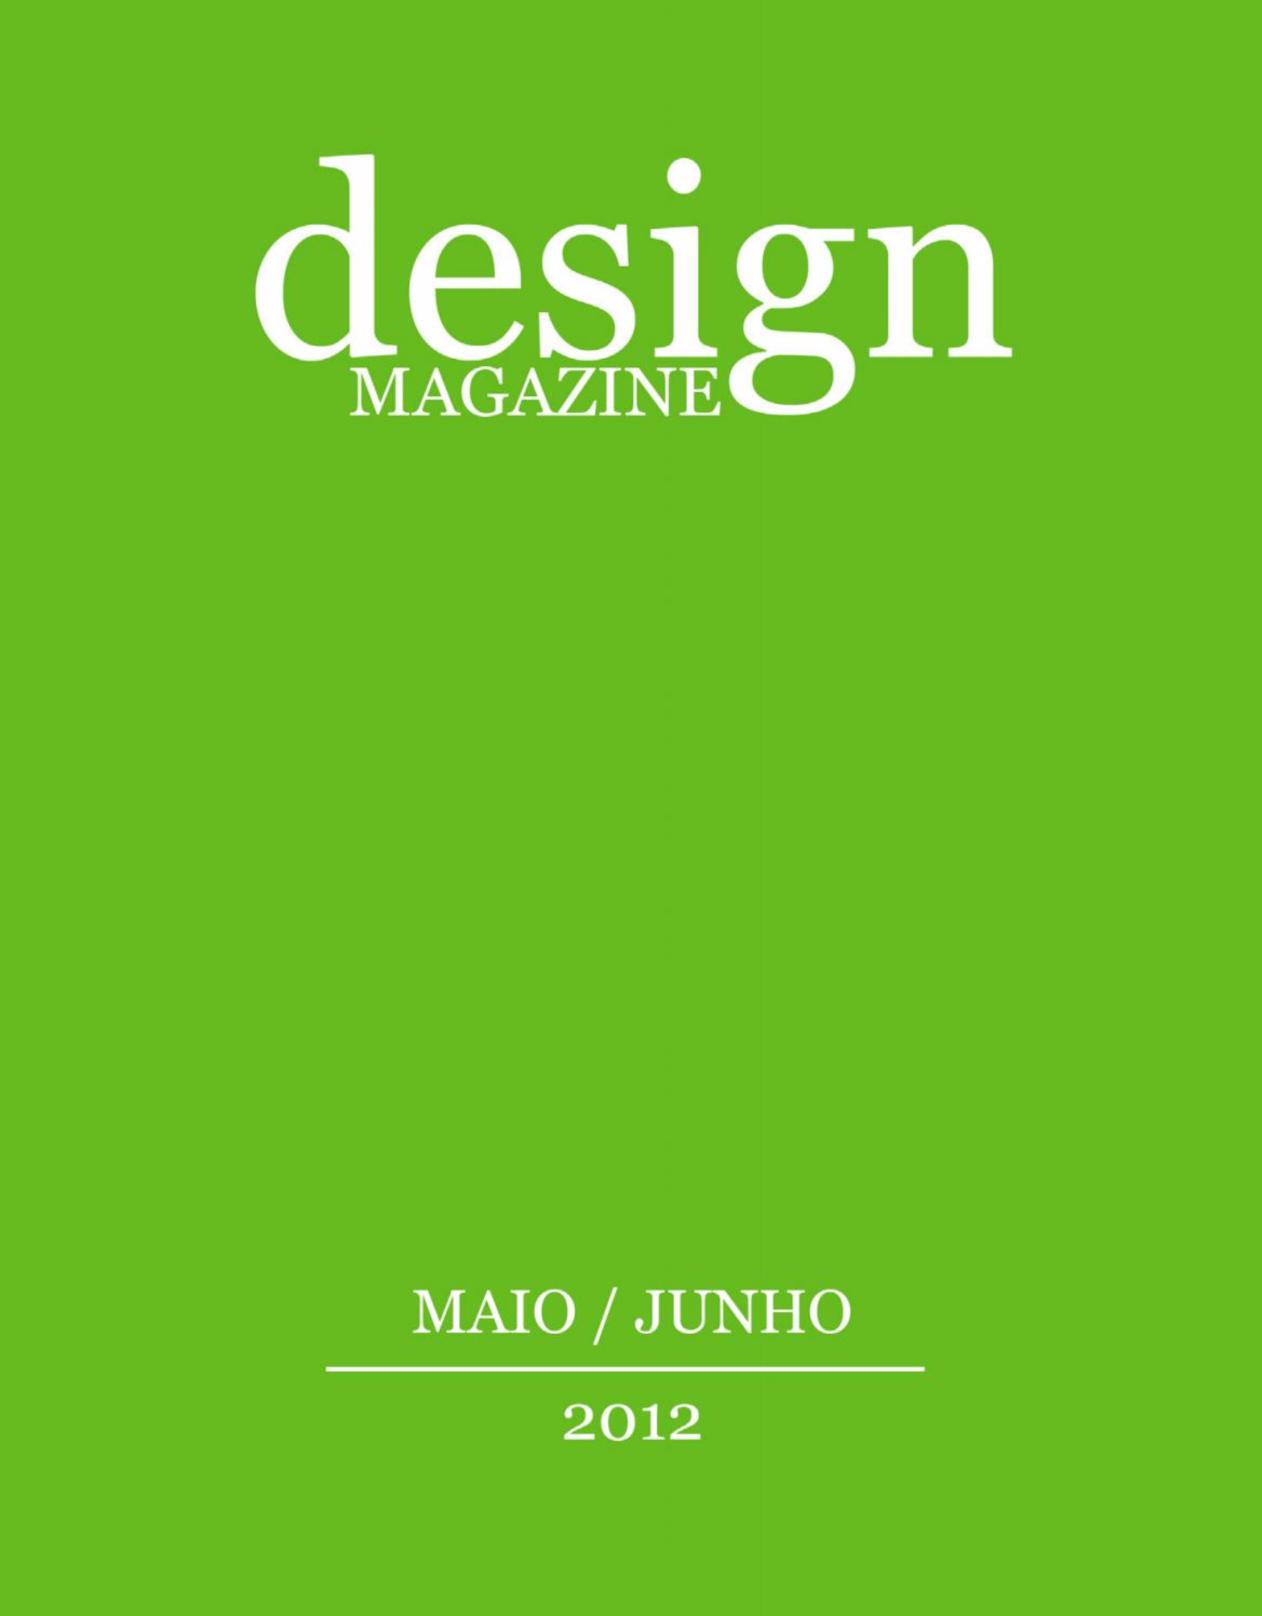 design magazine #5, Maio / Junho 2012